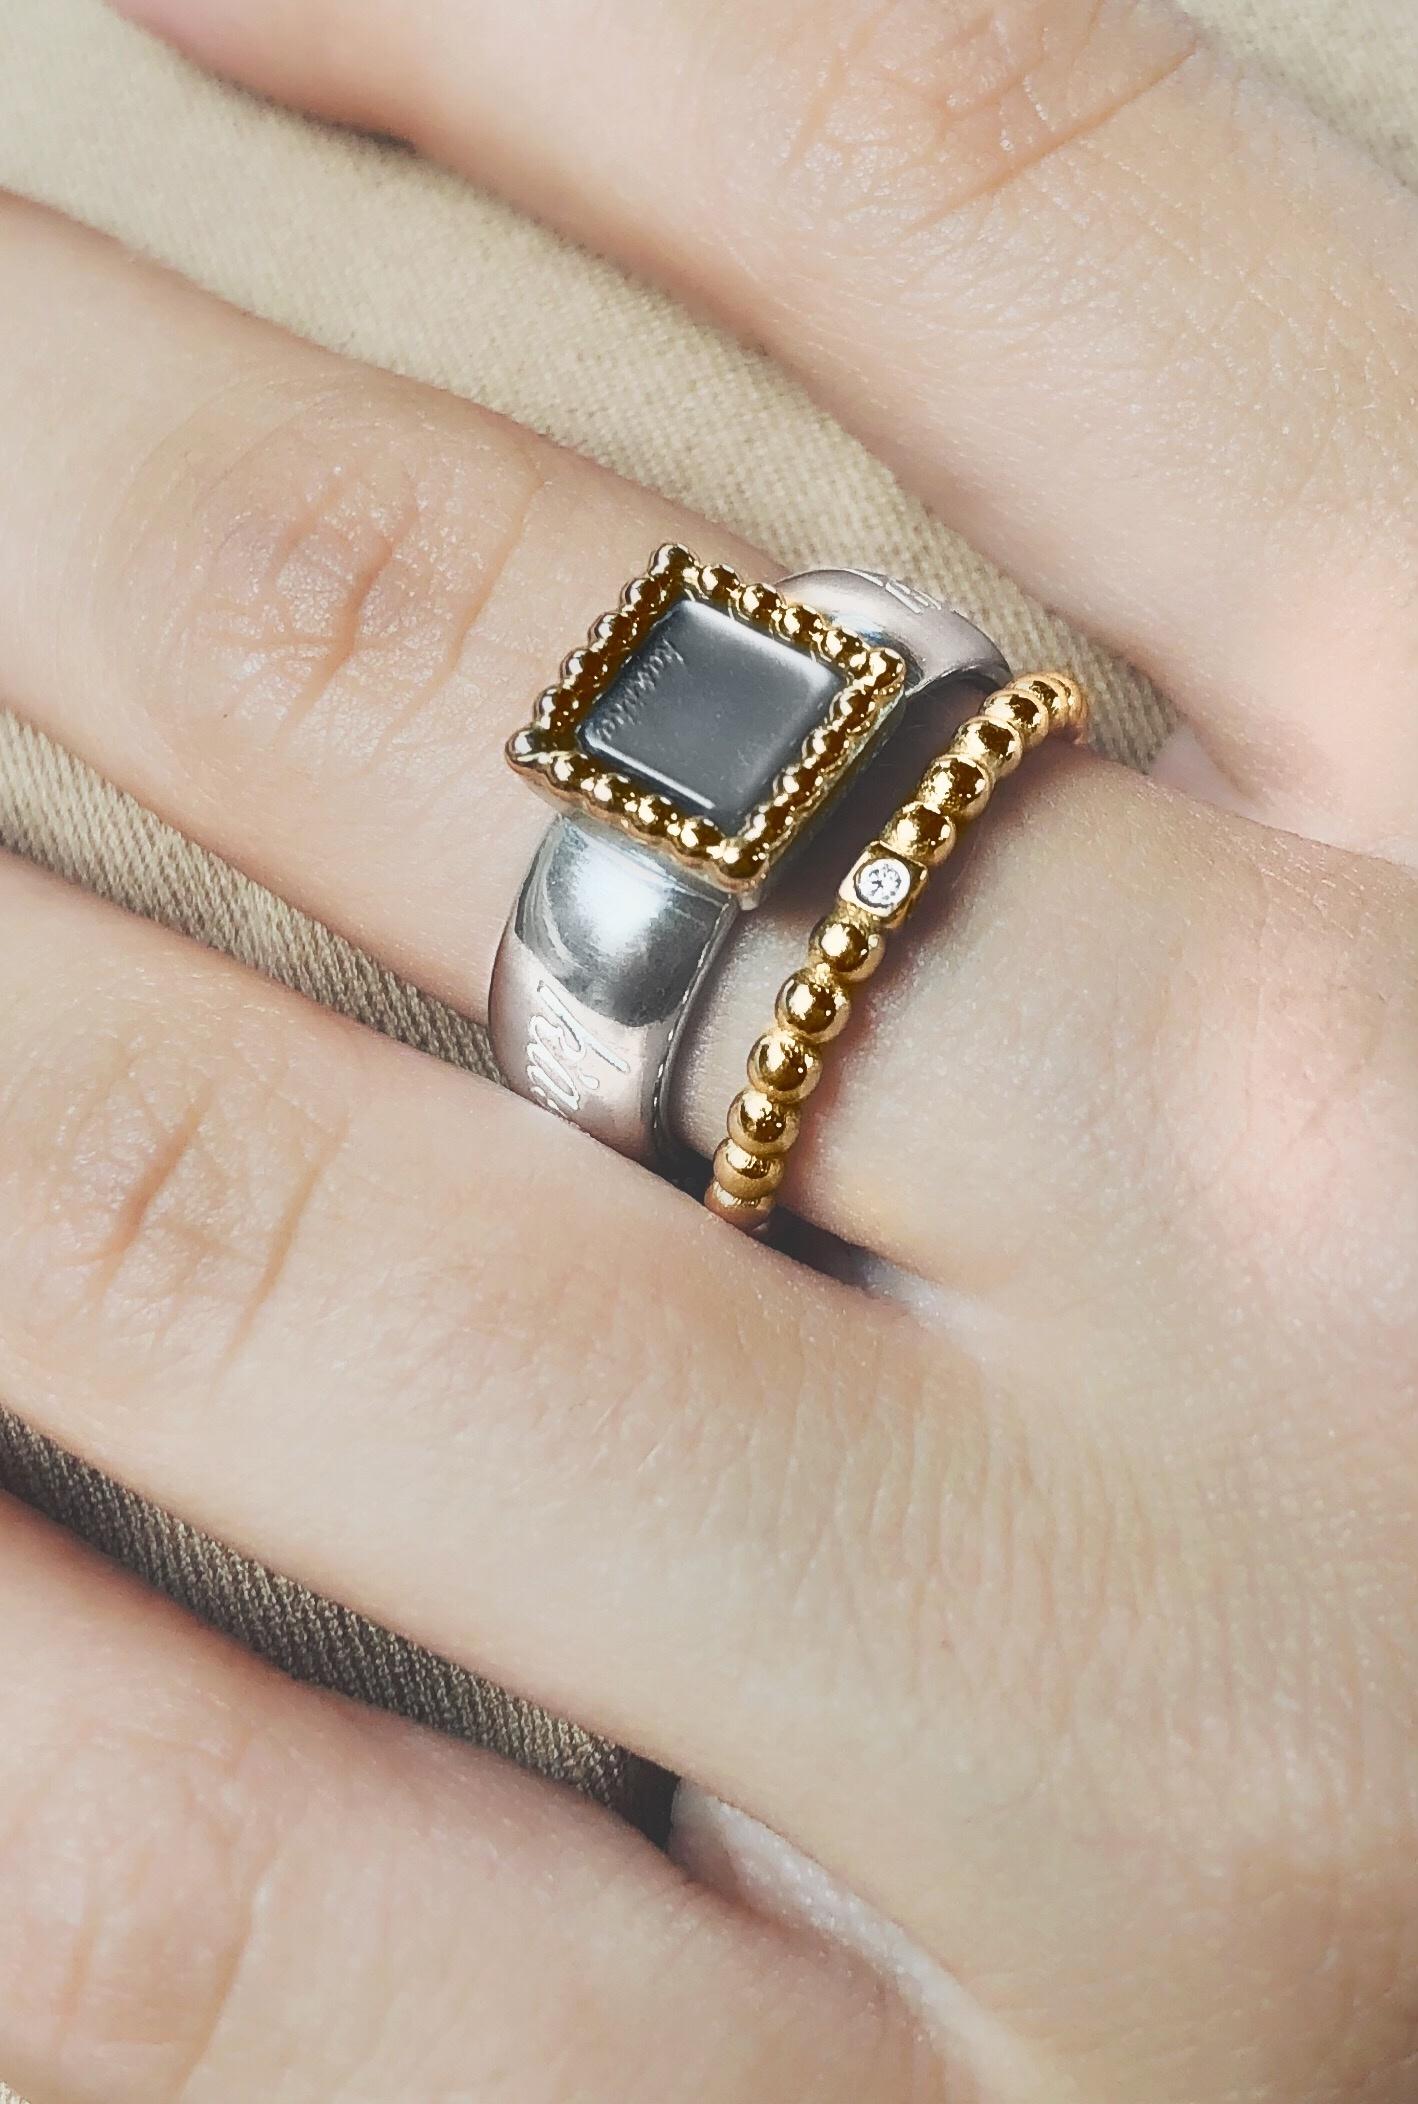 K'aschka Jewellery